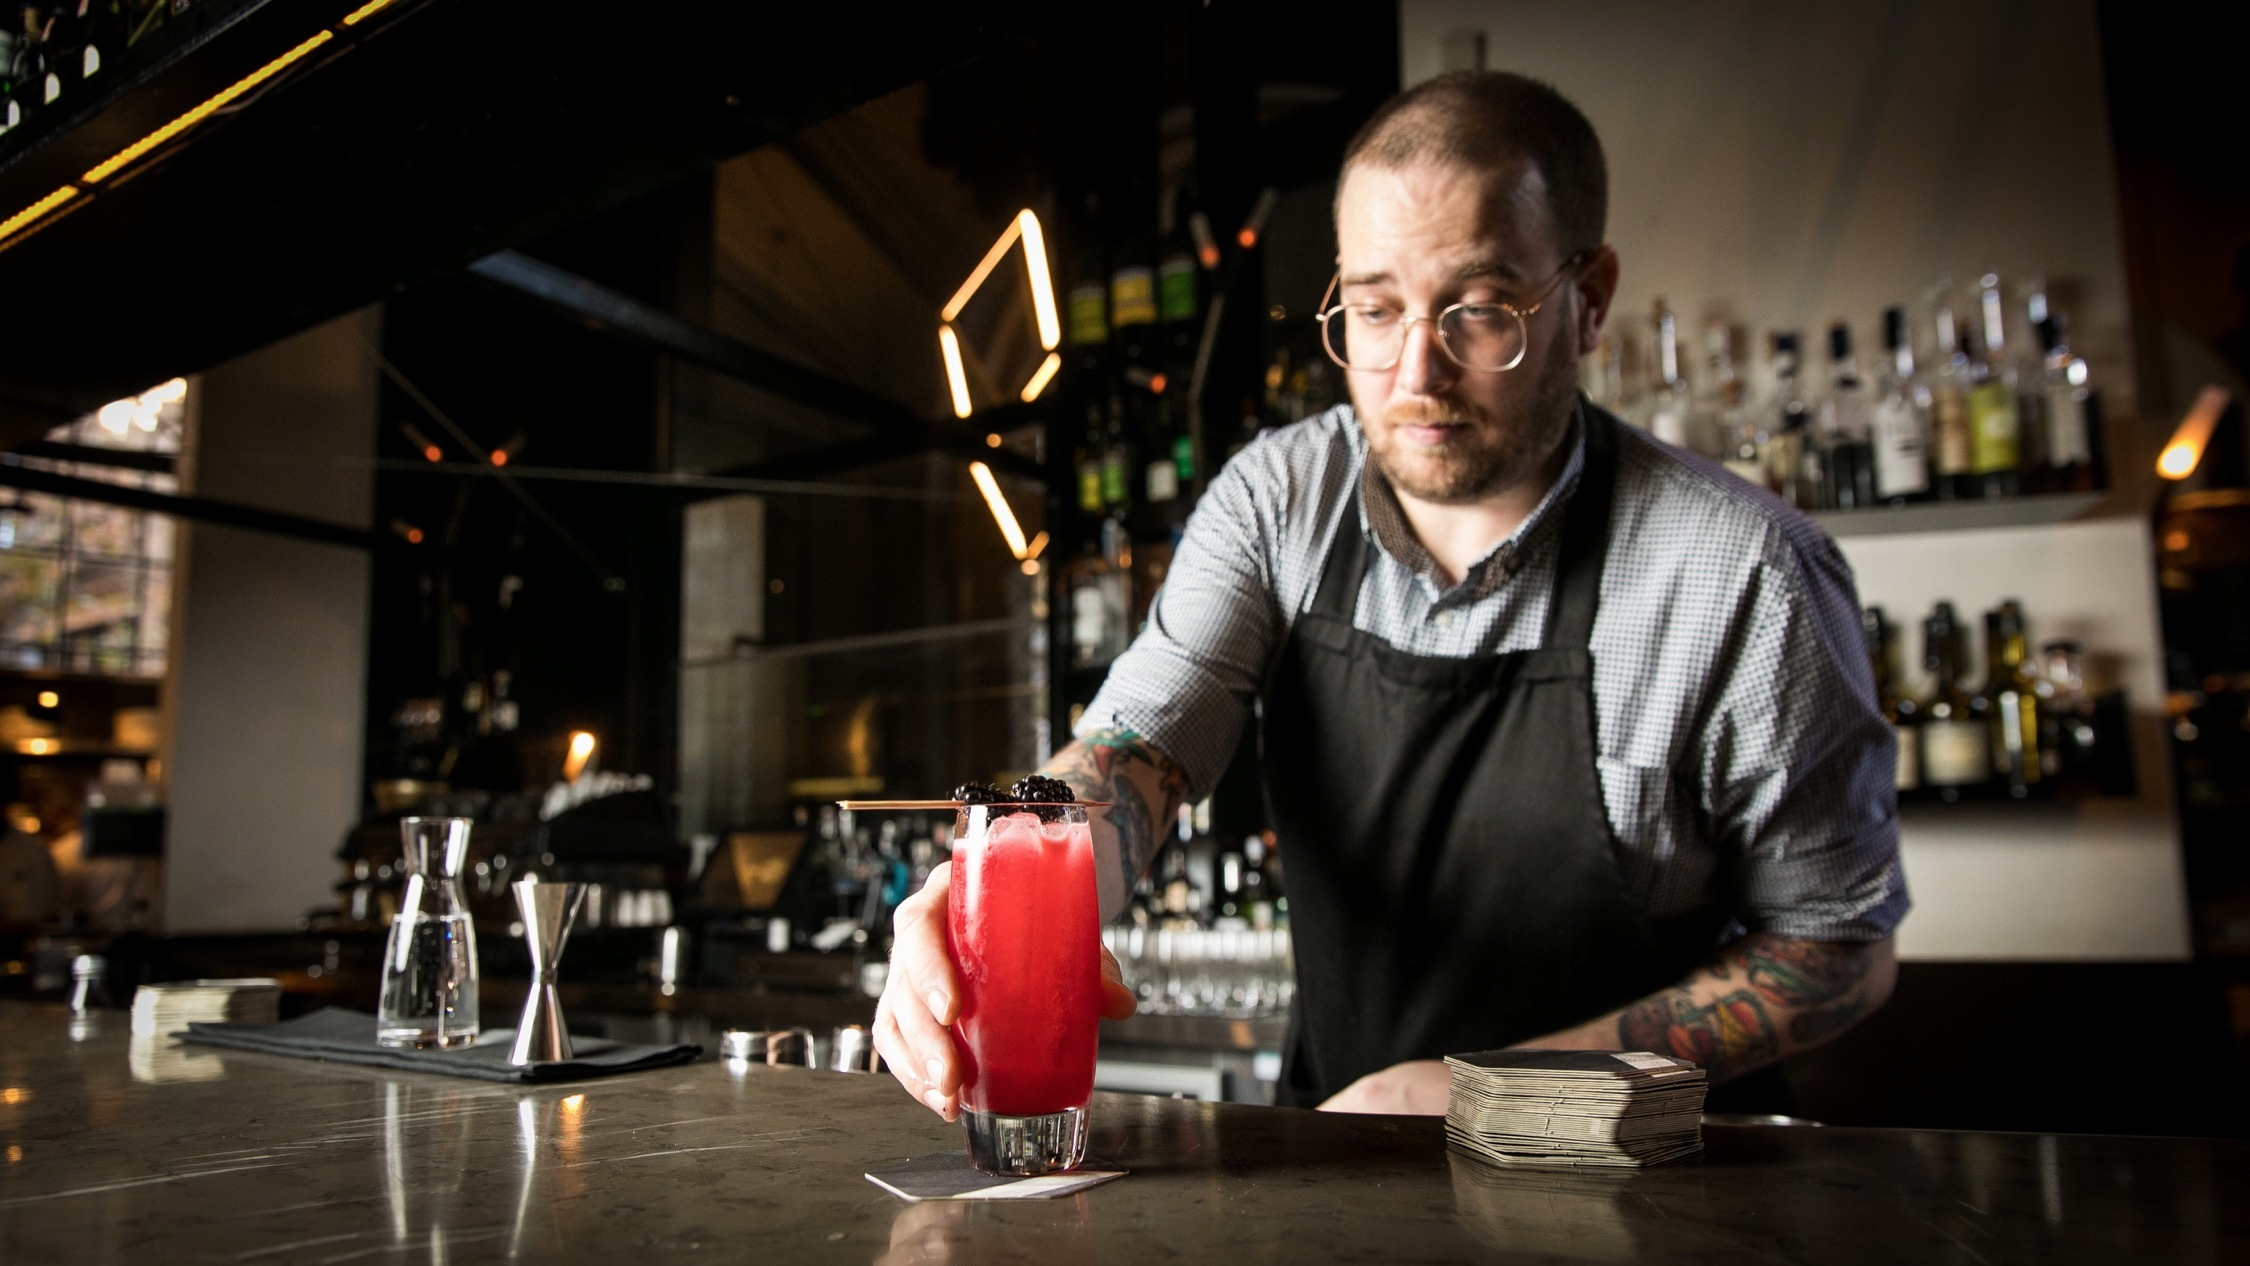 Making cocktails  at Bentley Bar and Restaurant